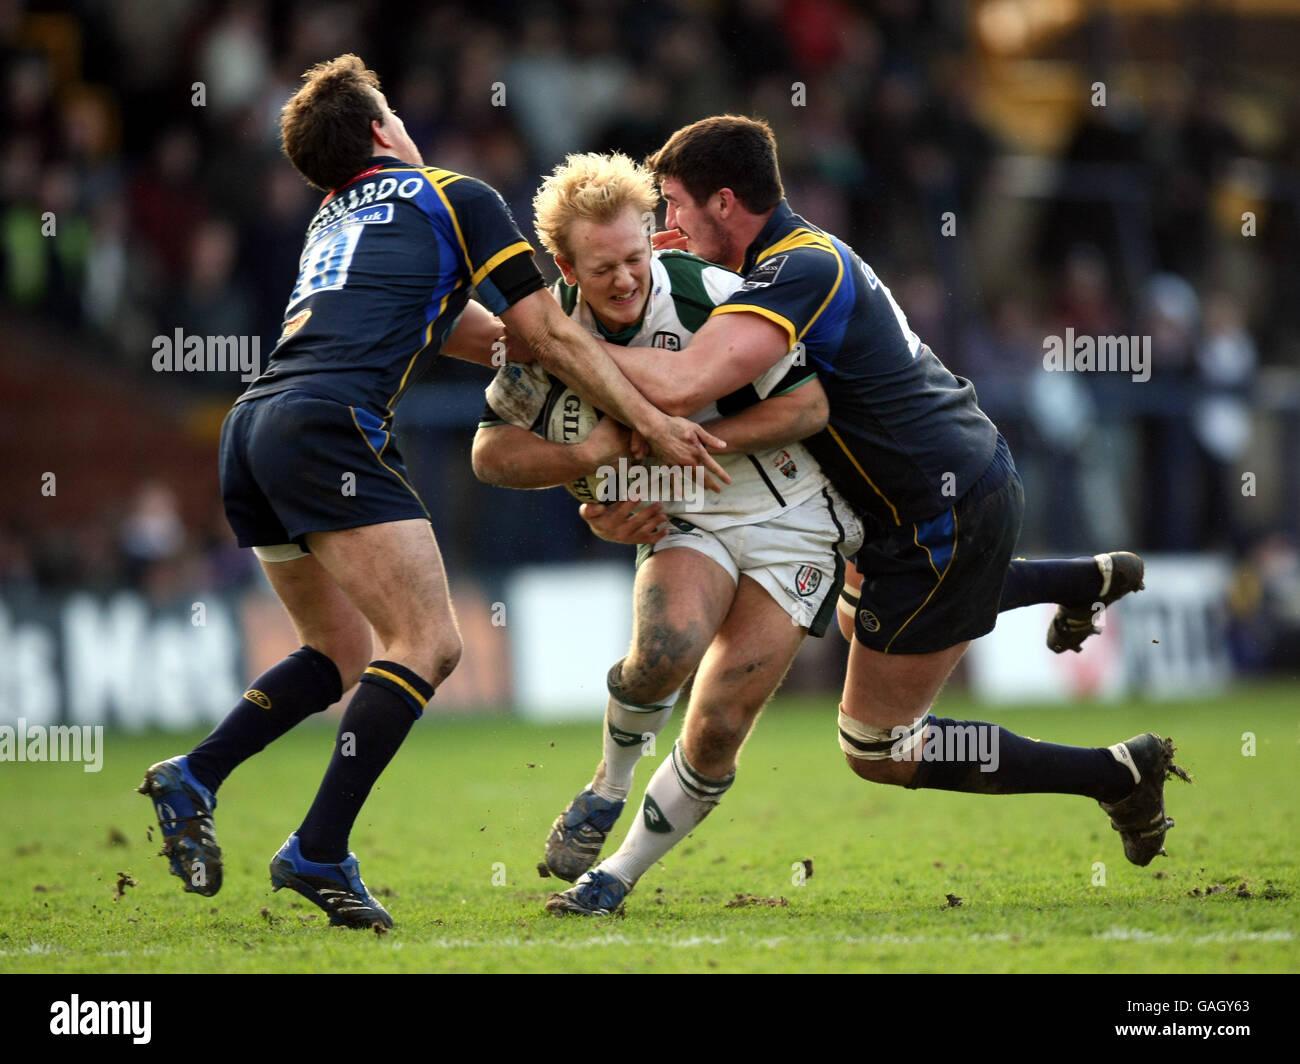 Rugby Union - Guinness Premiership - Leeds Carnegie v London Irish - Headingley Stadium Foto Stock